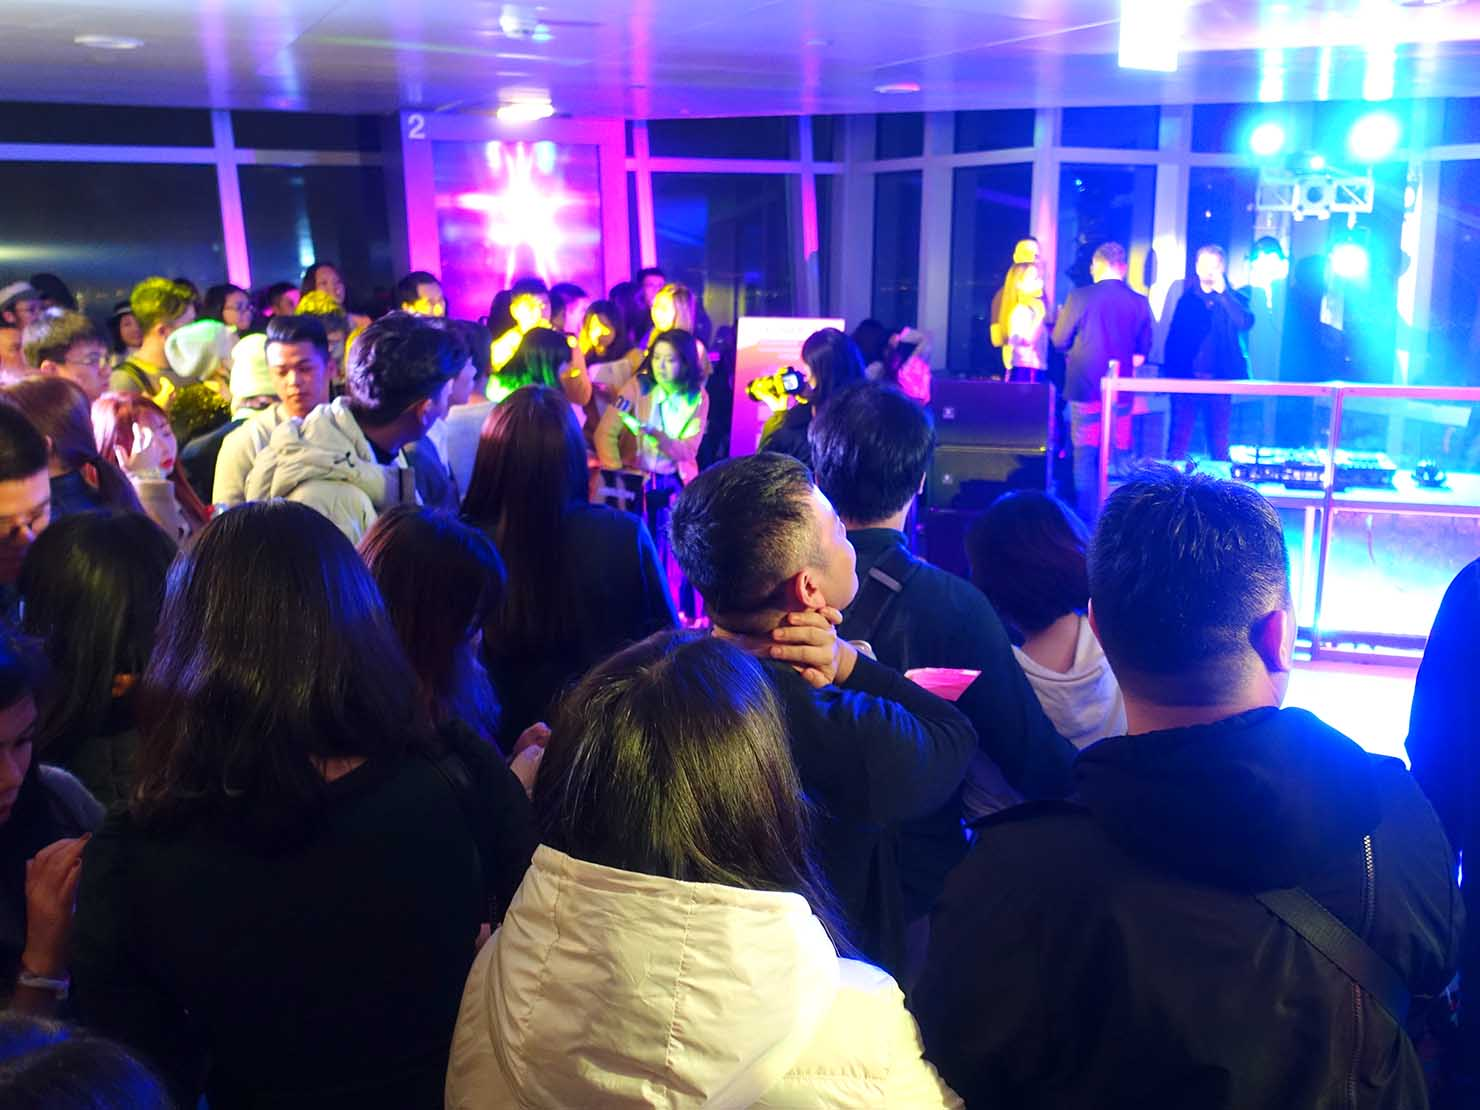 KKday「台北101 89階展望台カウントダウンパーティー」の抽選会